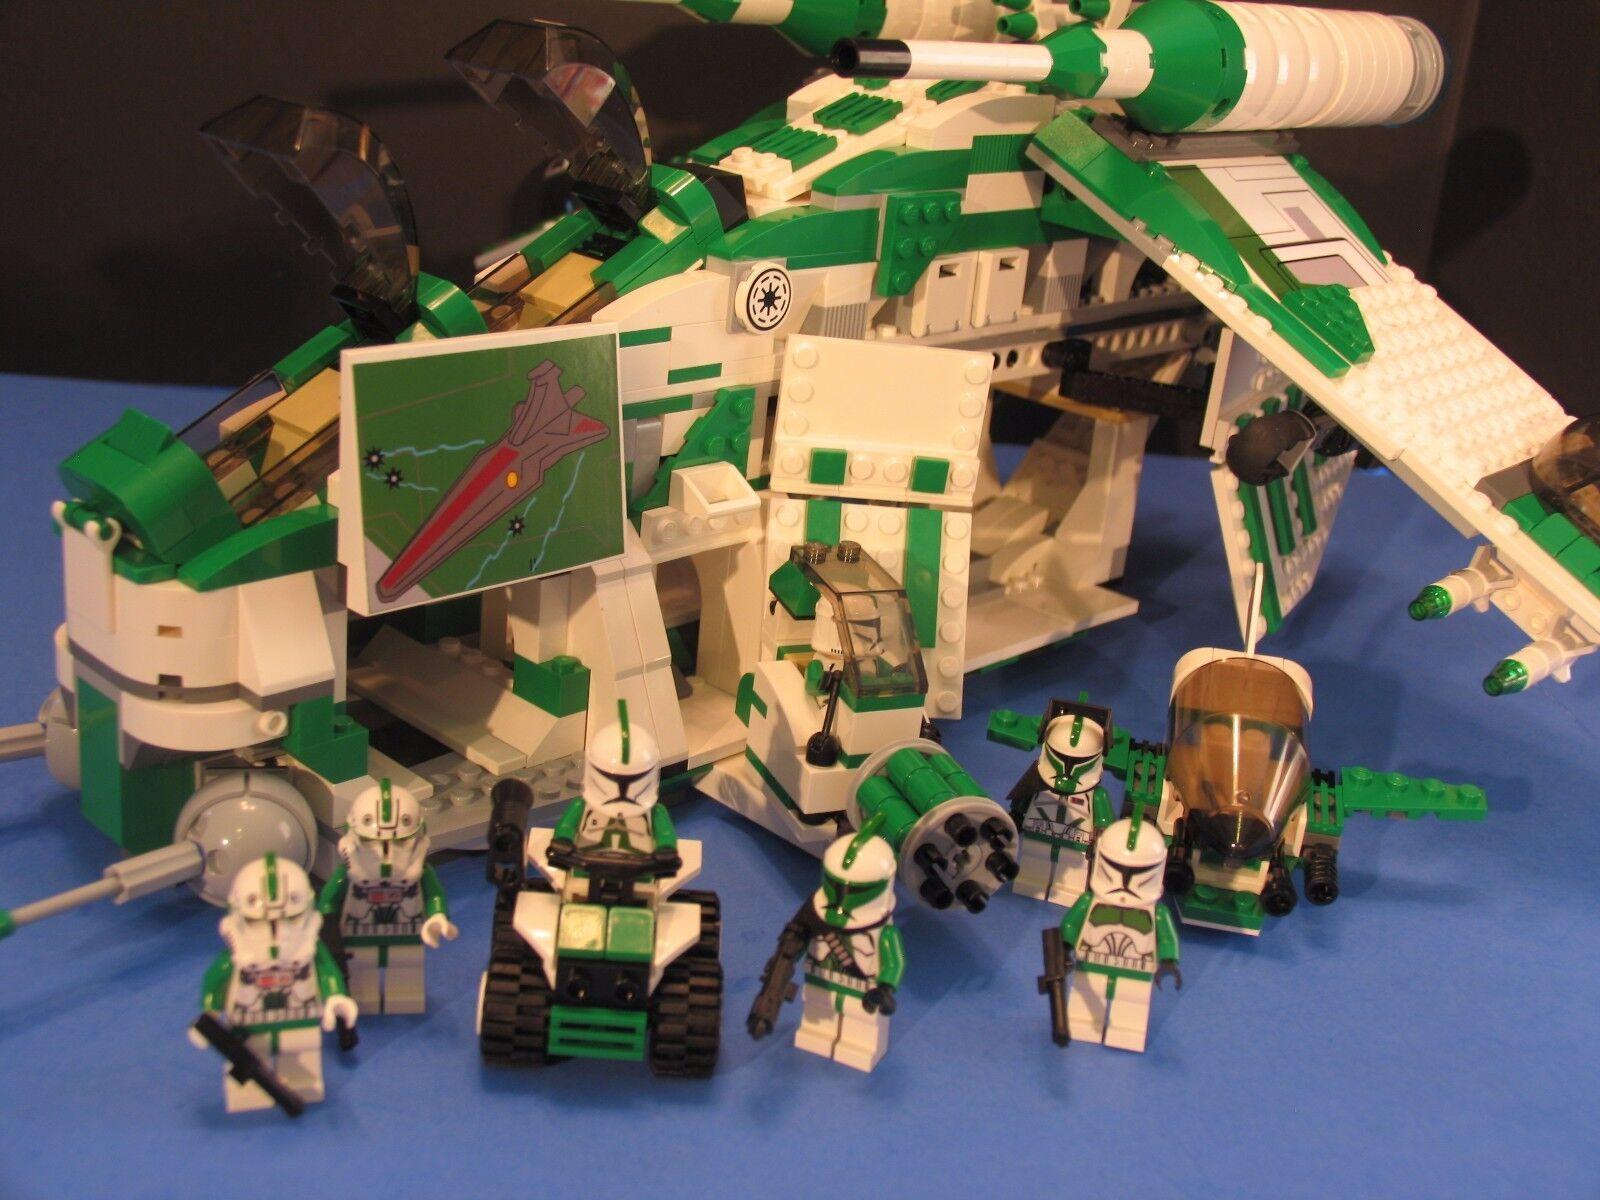 LEGO® brick STAR WARS™ DELUXE 501st LEGION CLONE TROOPER Minifigure 100/% LEGO